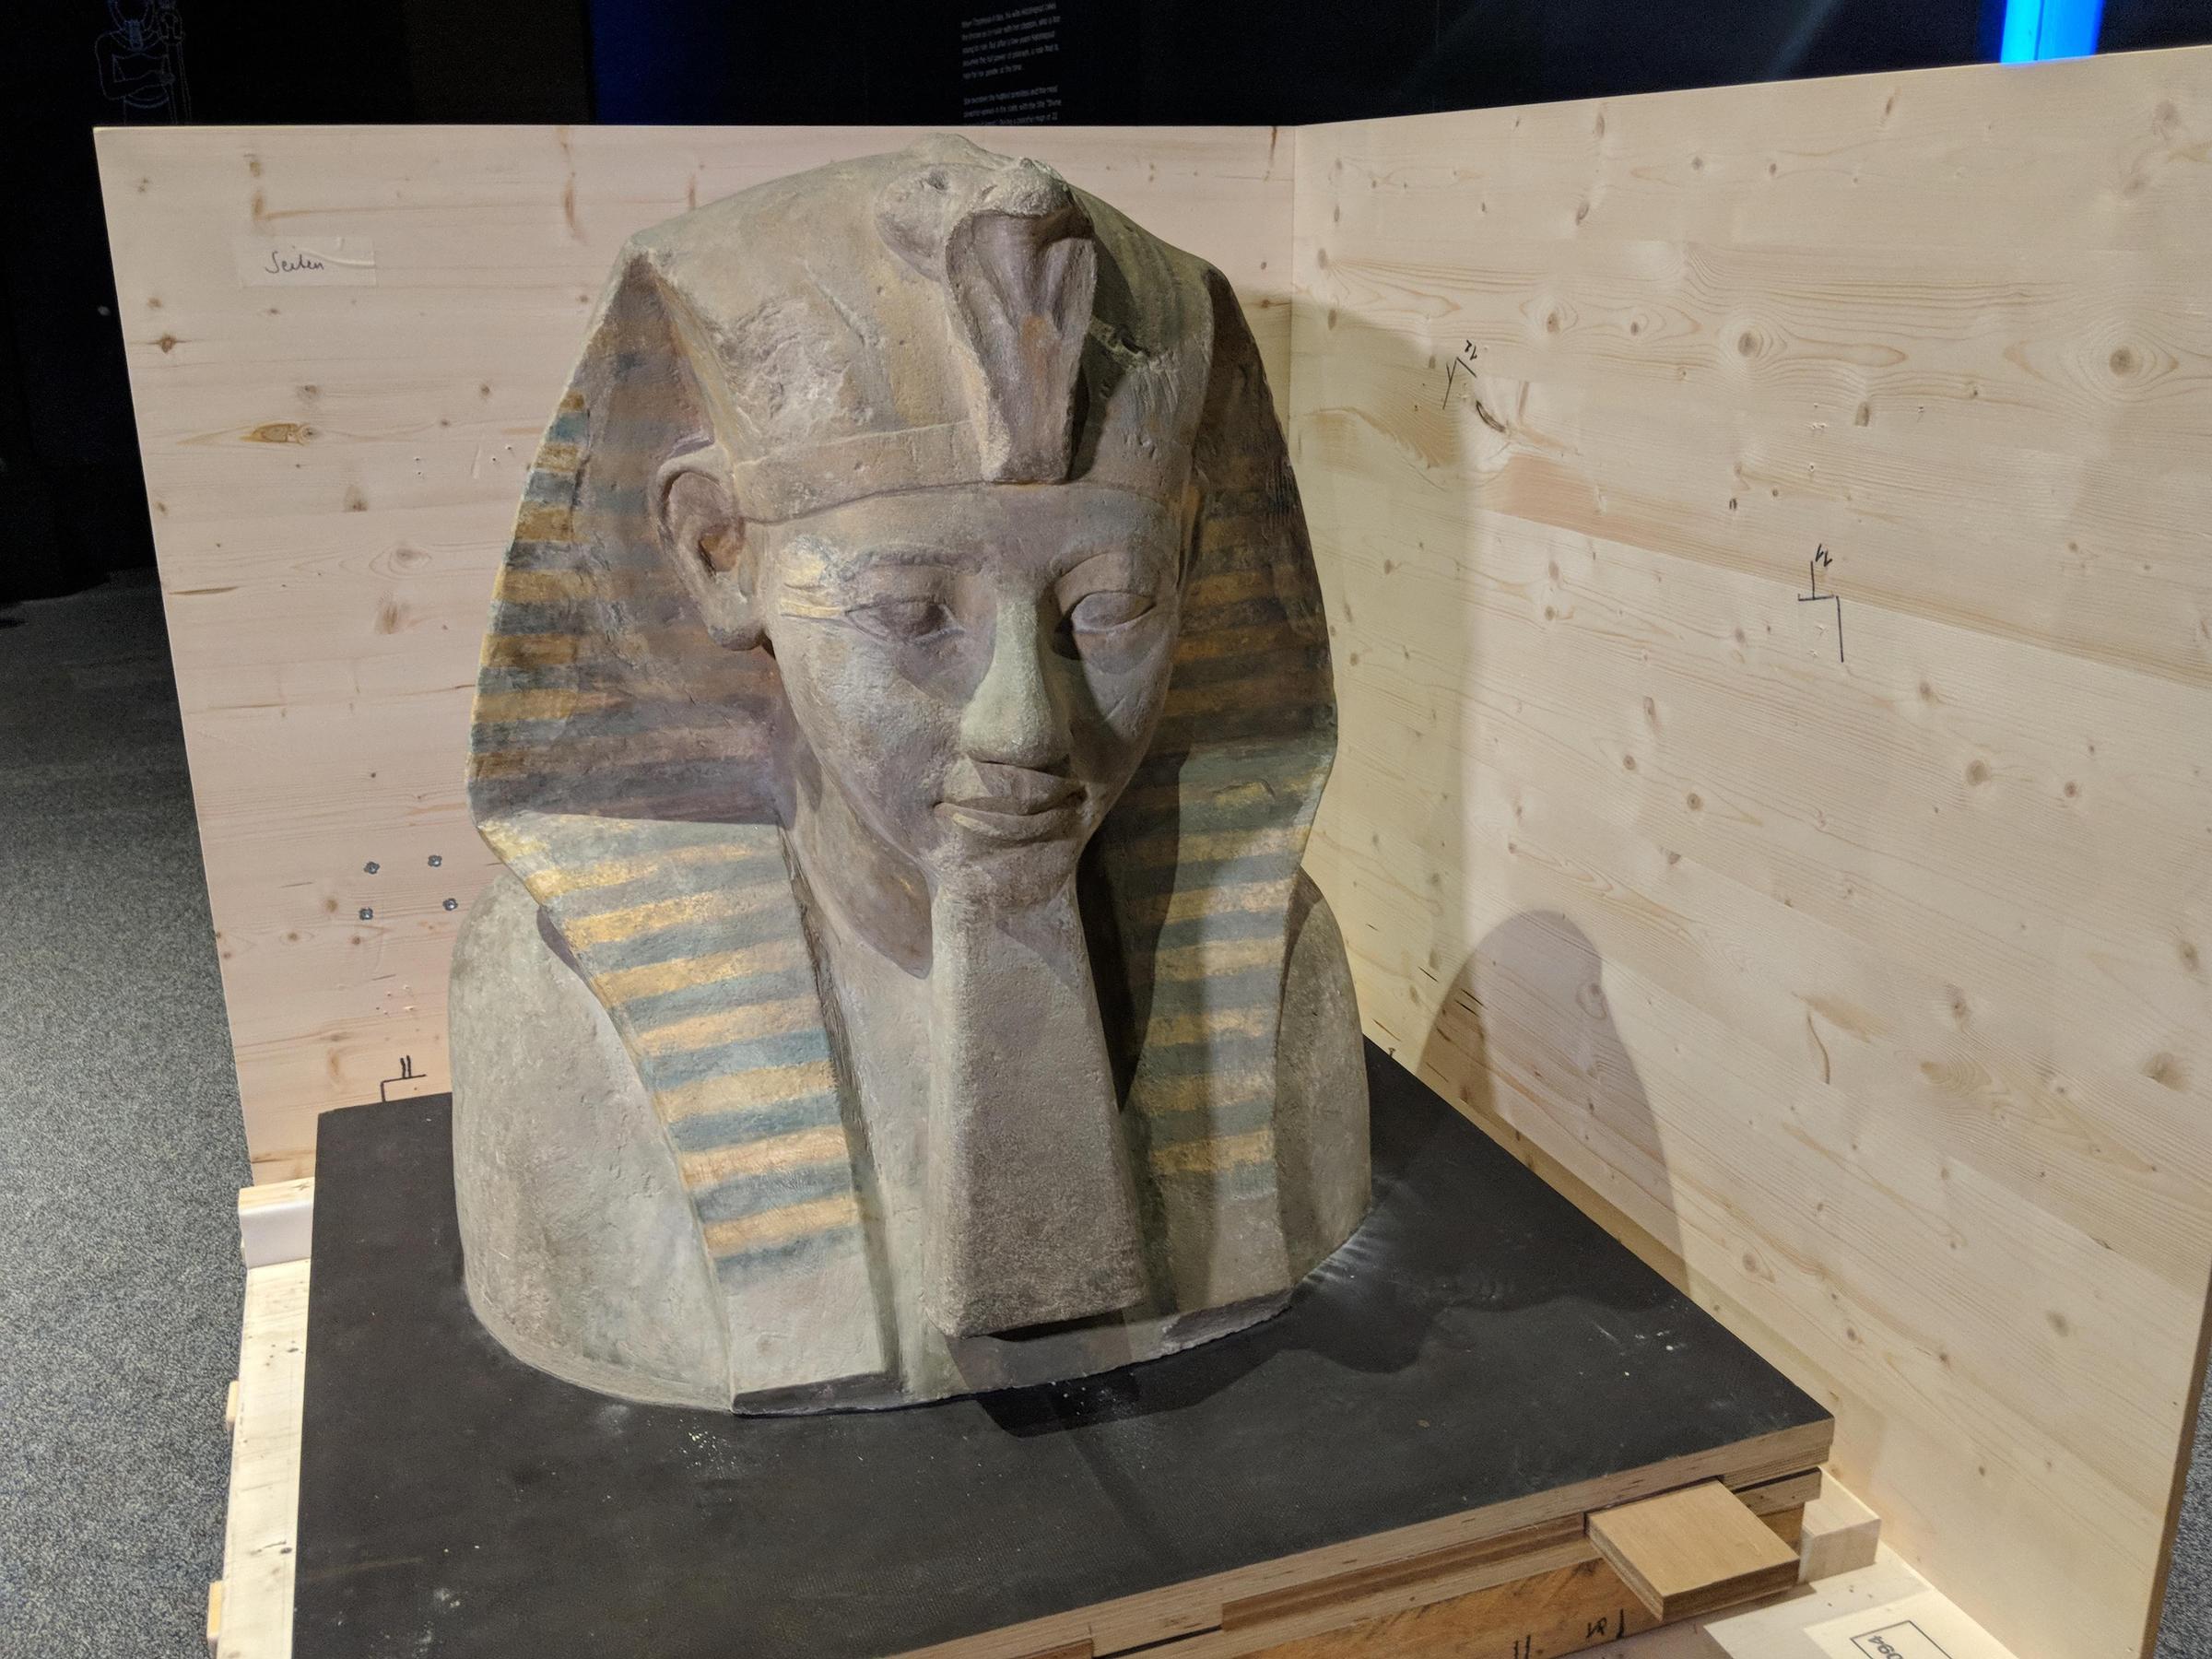 Ancient Egyptian Artifacts Visit Cincinnati - And America